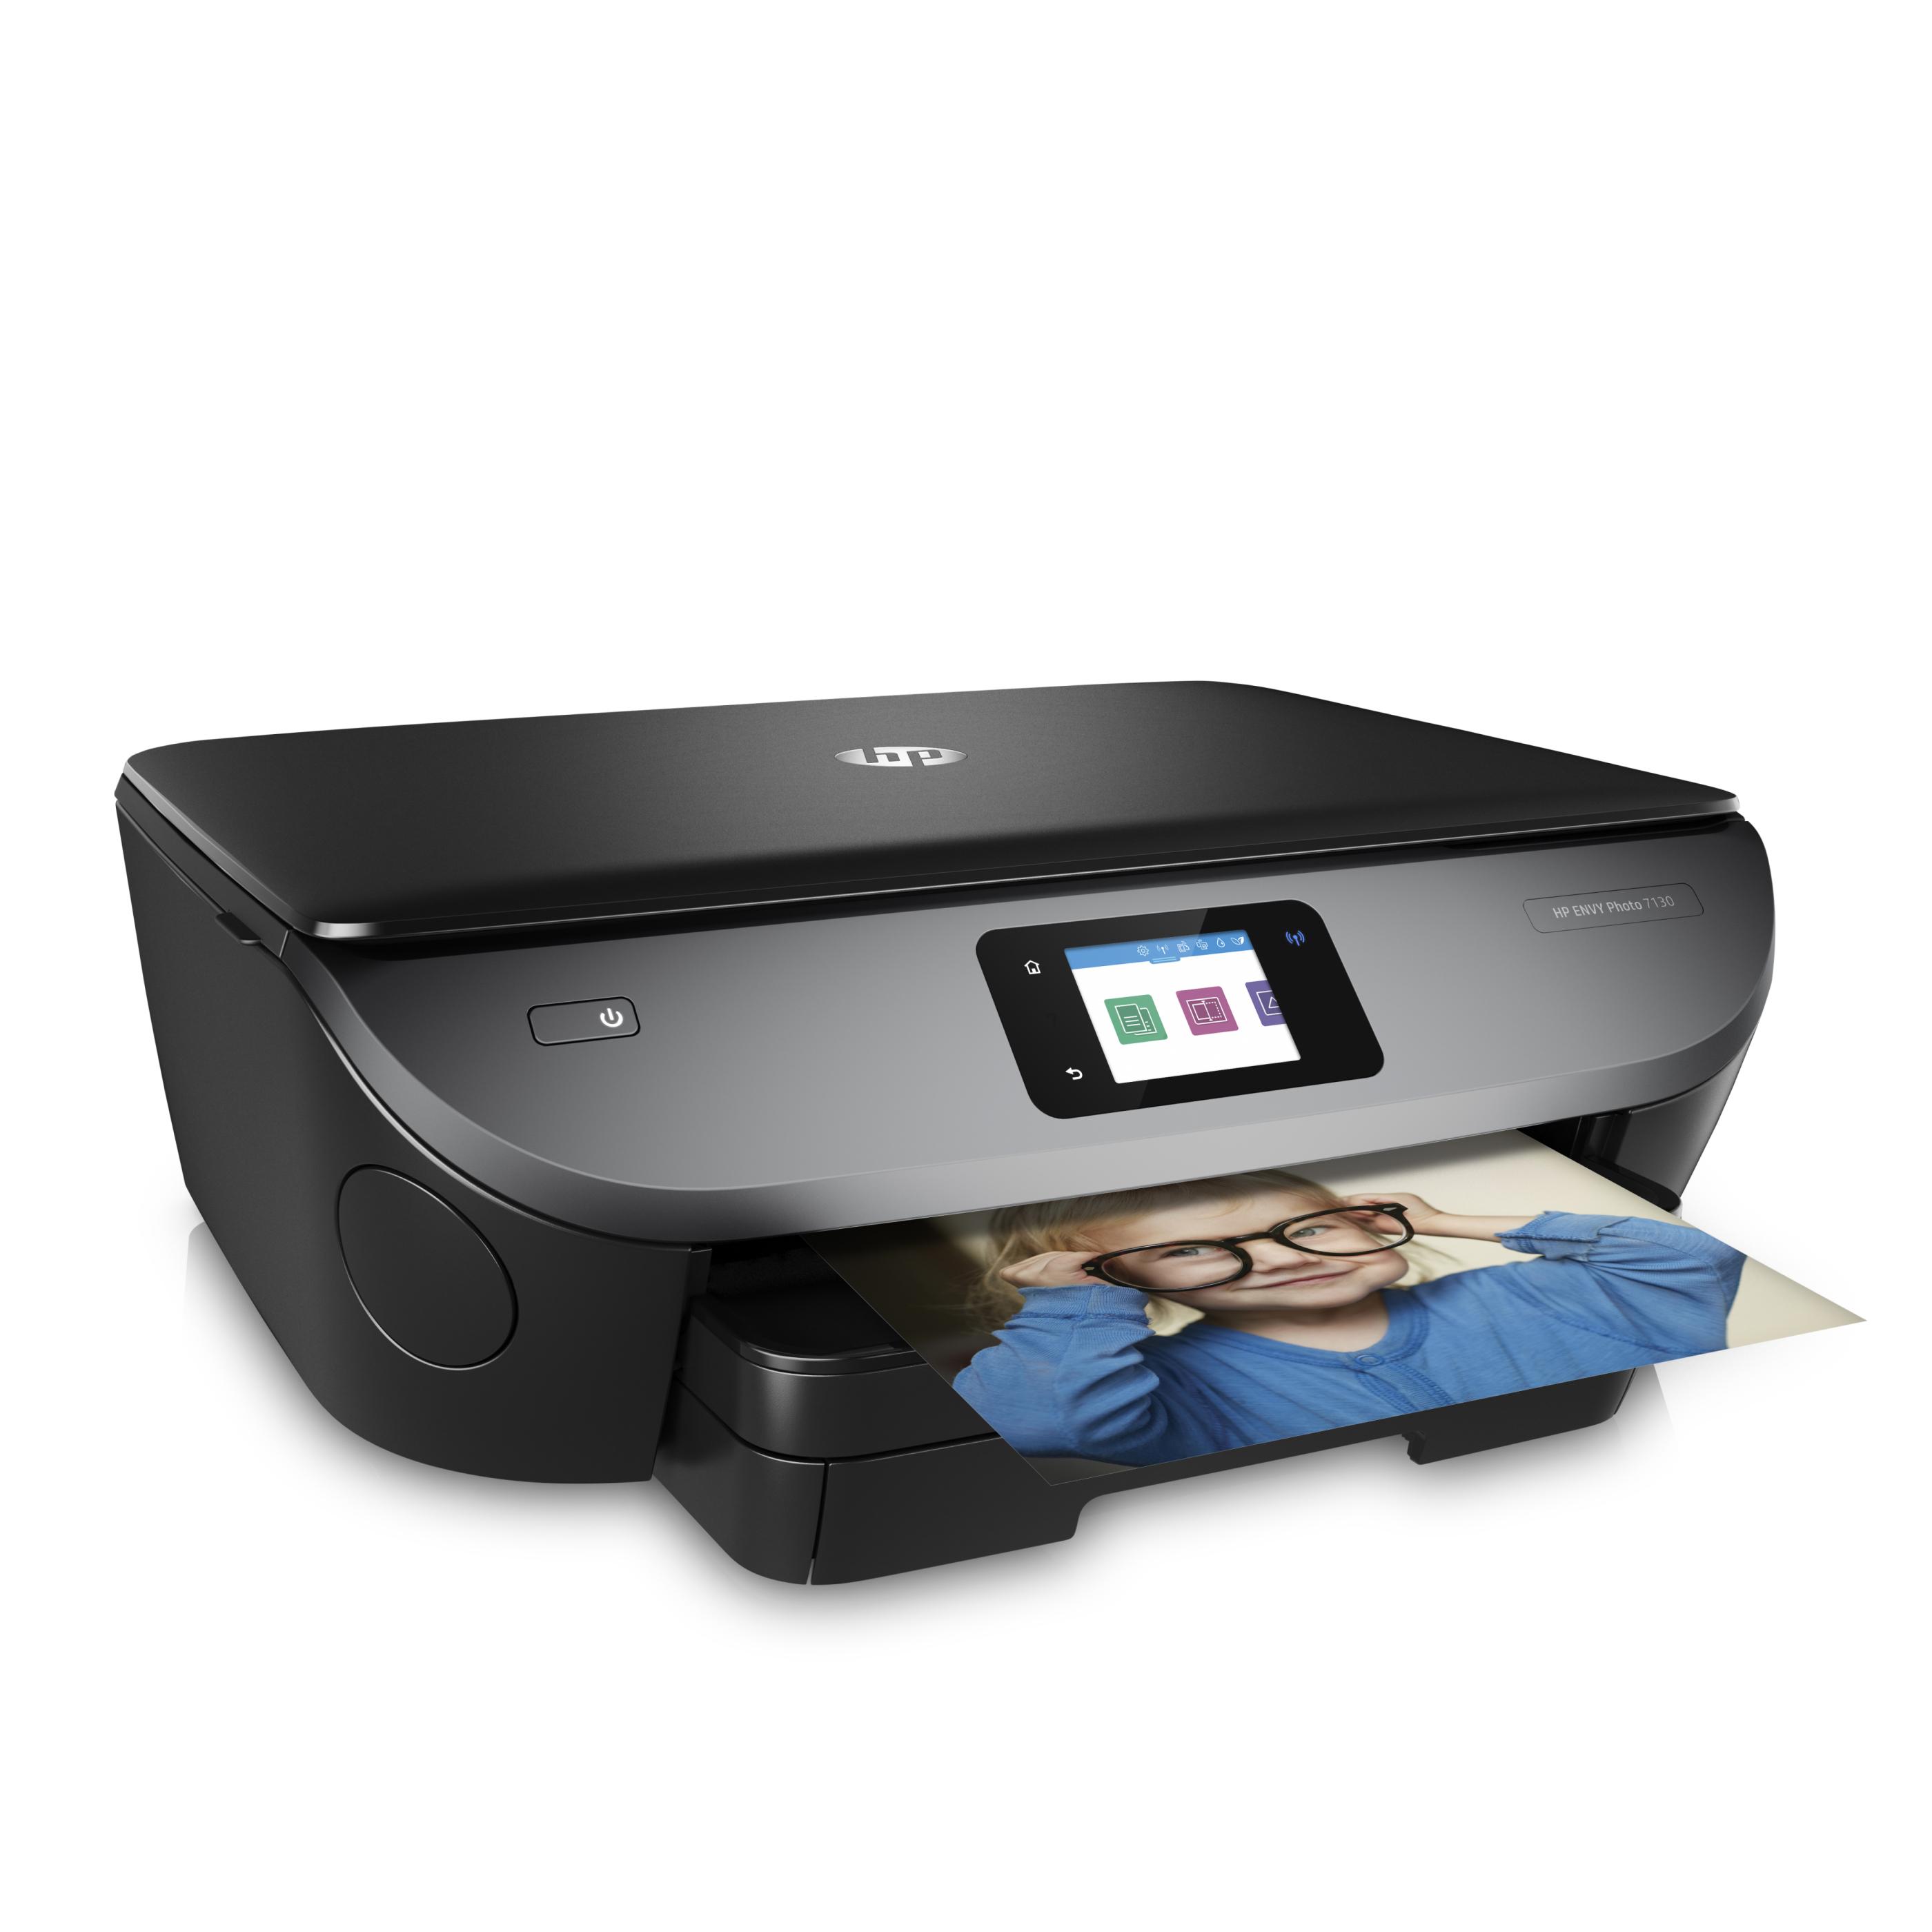 NBB-Blitzdeals: z.B. Multifunktionsdrucker HP Envy Photo 7130 (Drucken, Scannen, Kopieren, 14 S/min, Duplex, USB, WLAN)